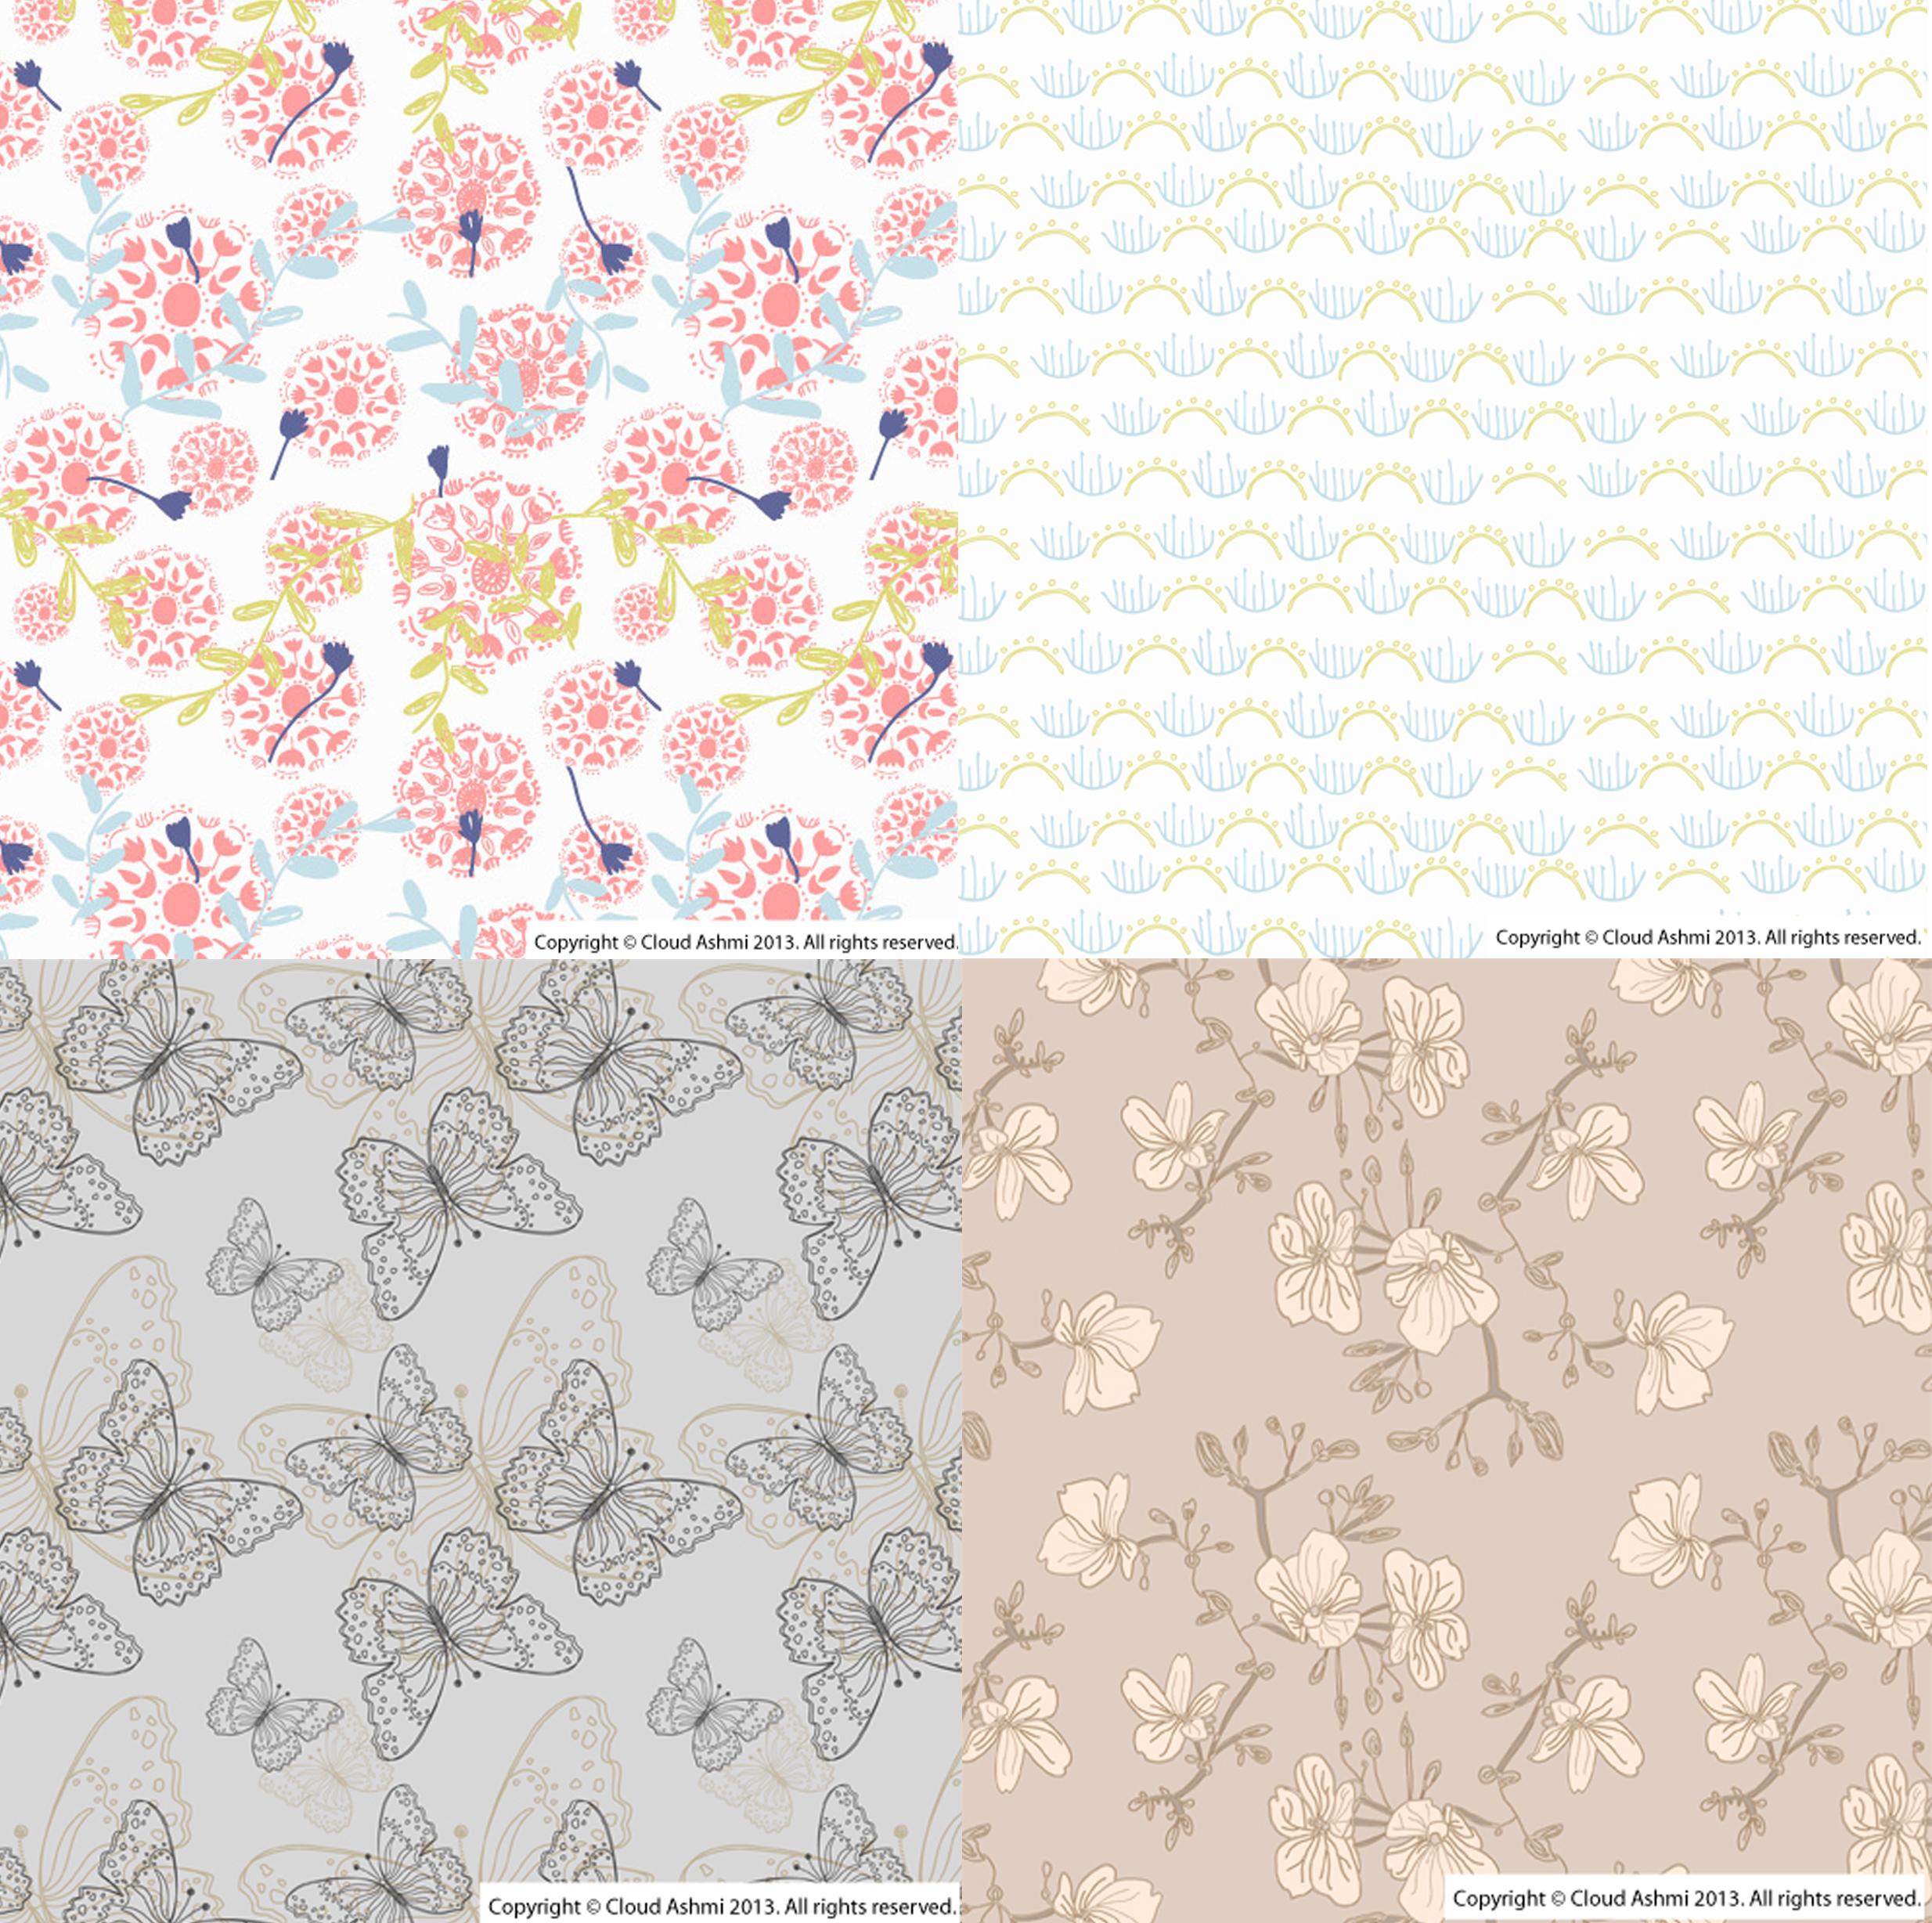 Homebase Wallpaper Collection WallpaperSafari